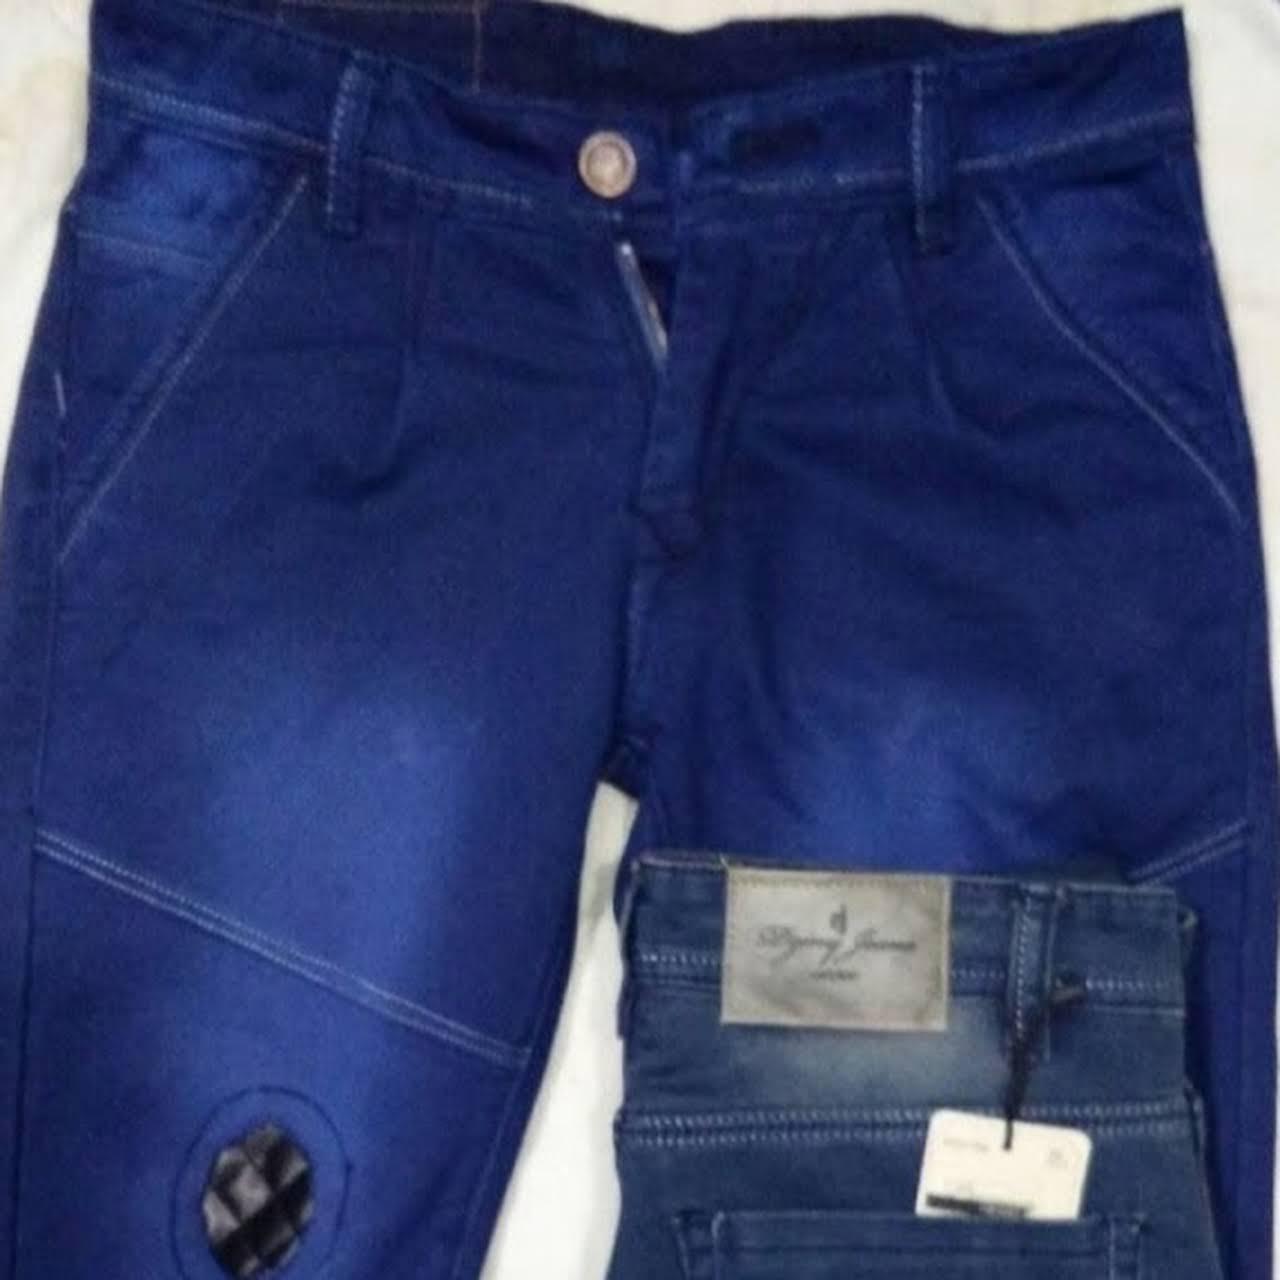 9fcb1666470 Jeans Manufacturers